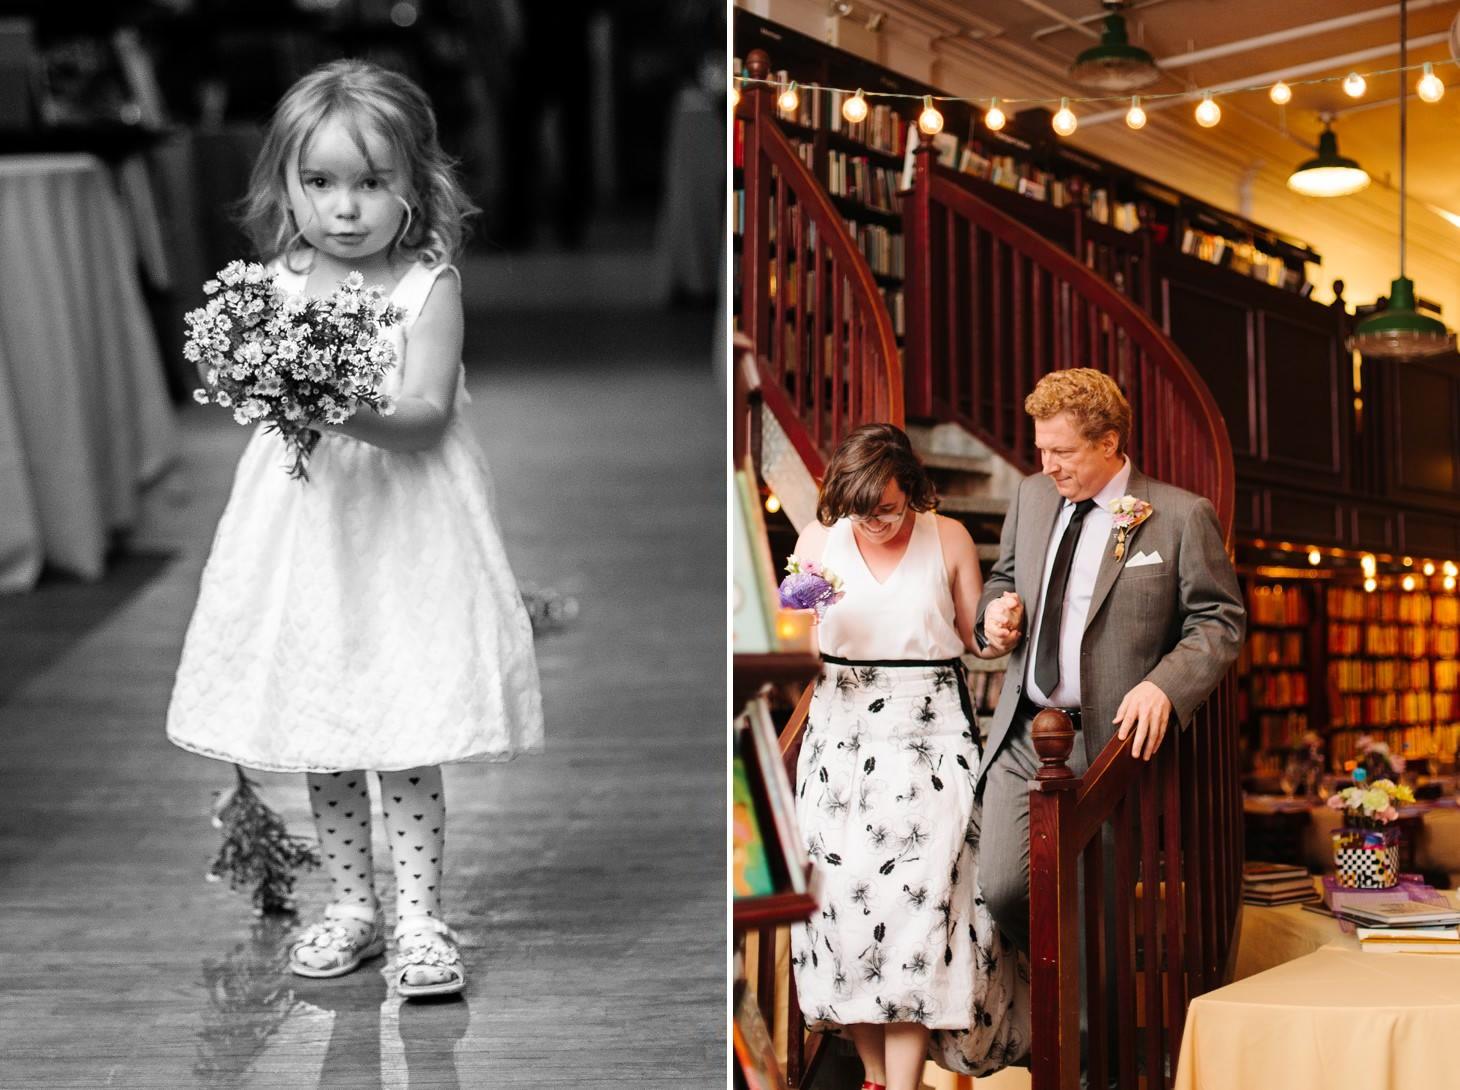 002-nyc-wedding-photographer-smitten-chickens-housing-works.jpg